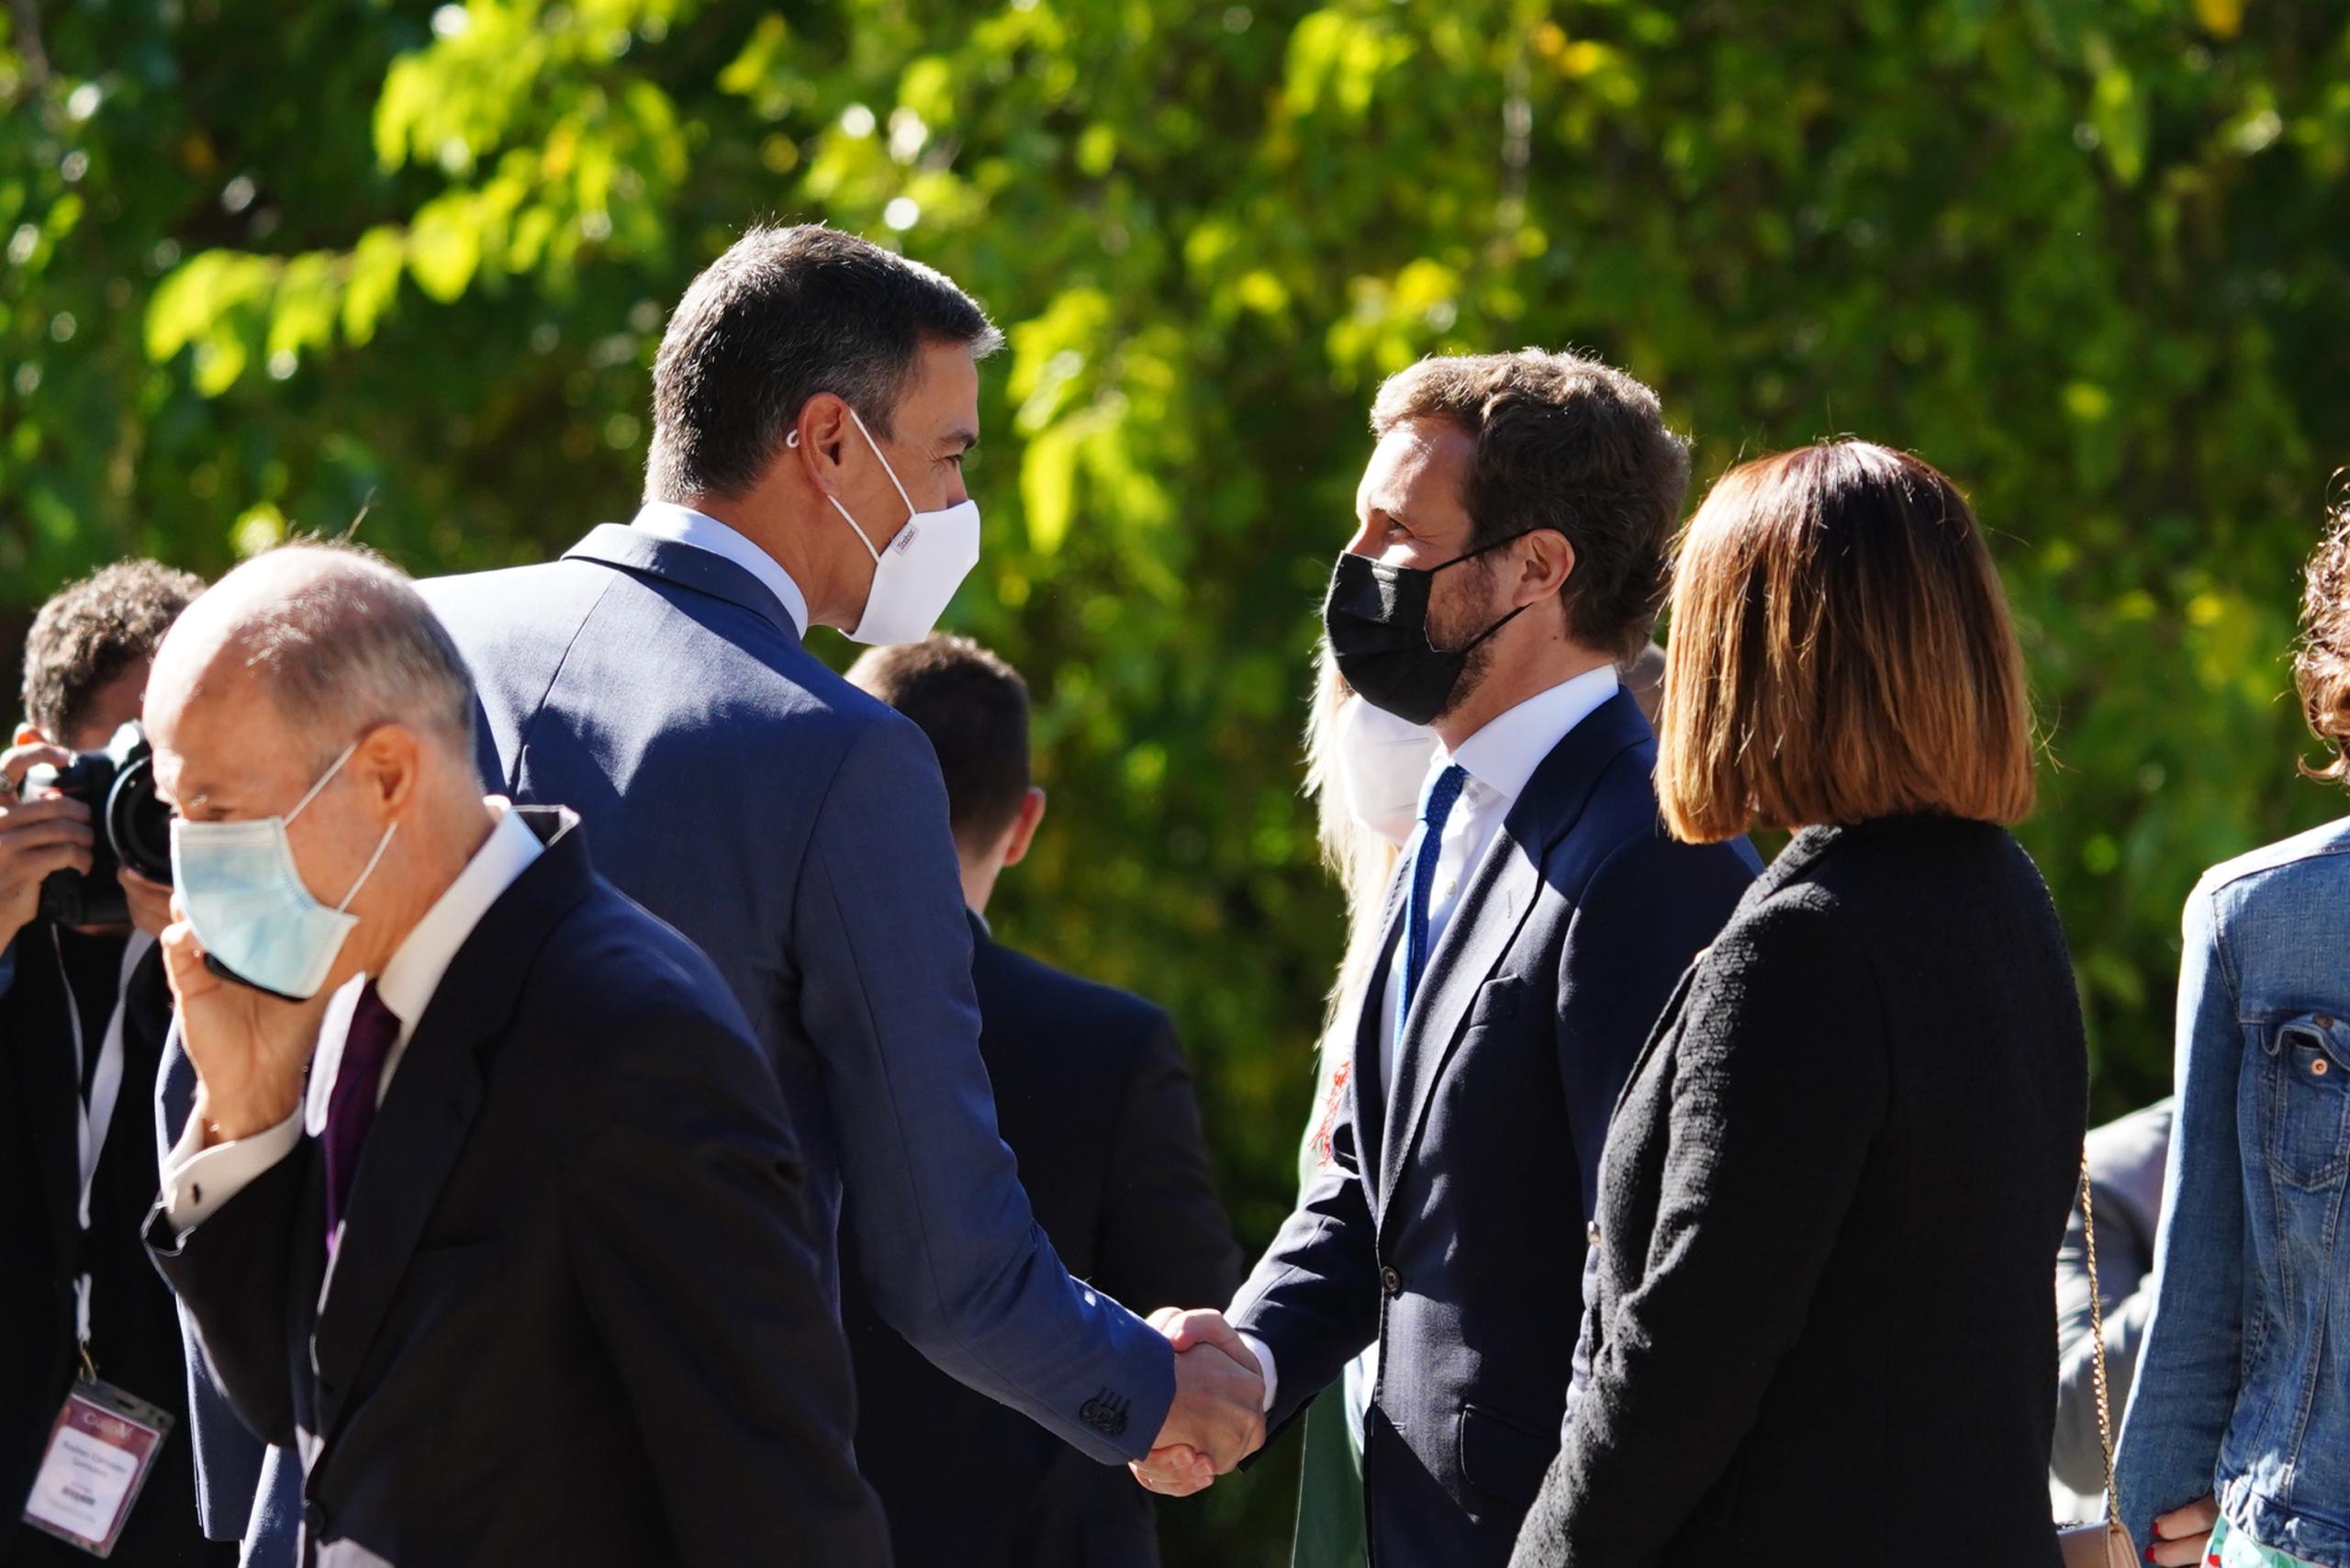 Pedro Sánchez i Pablo Casado es donen la mà | Europa Press